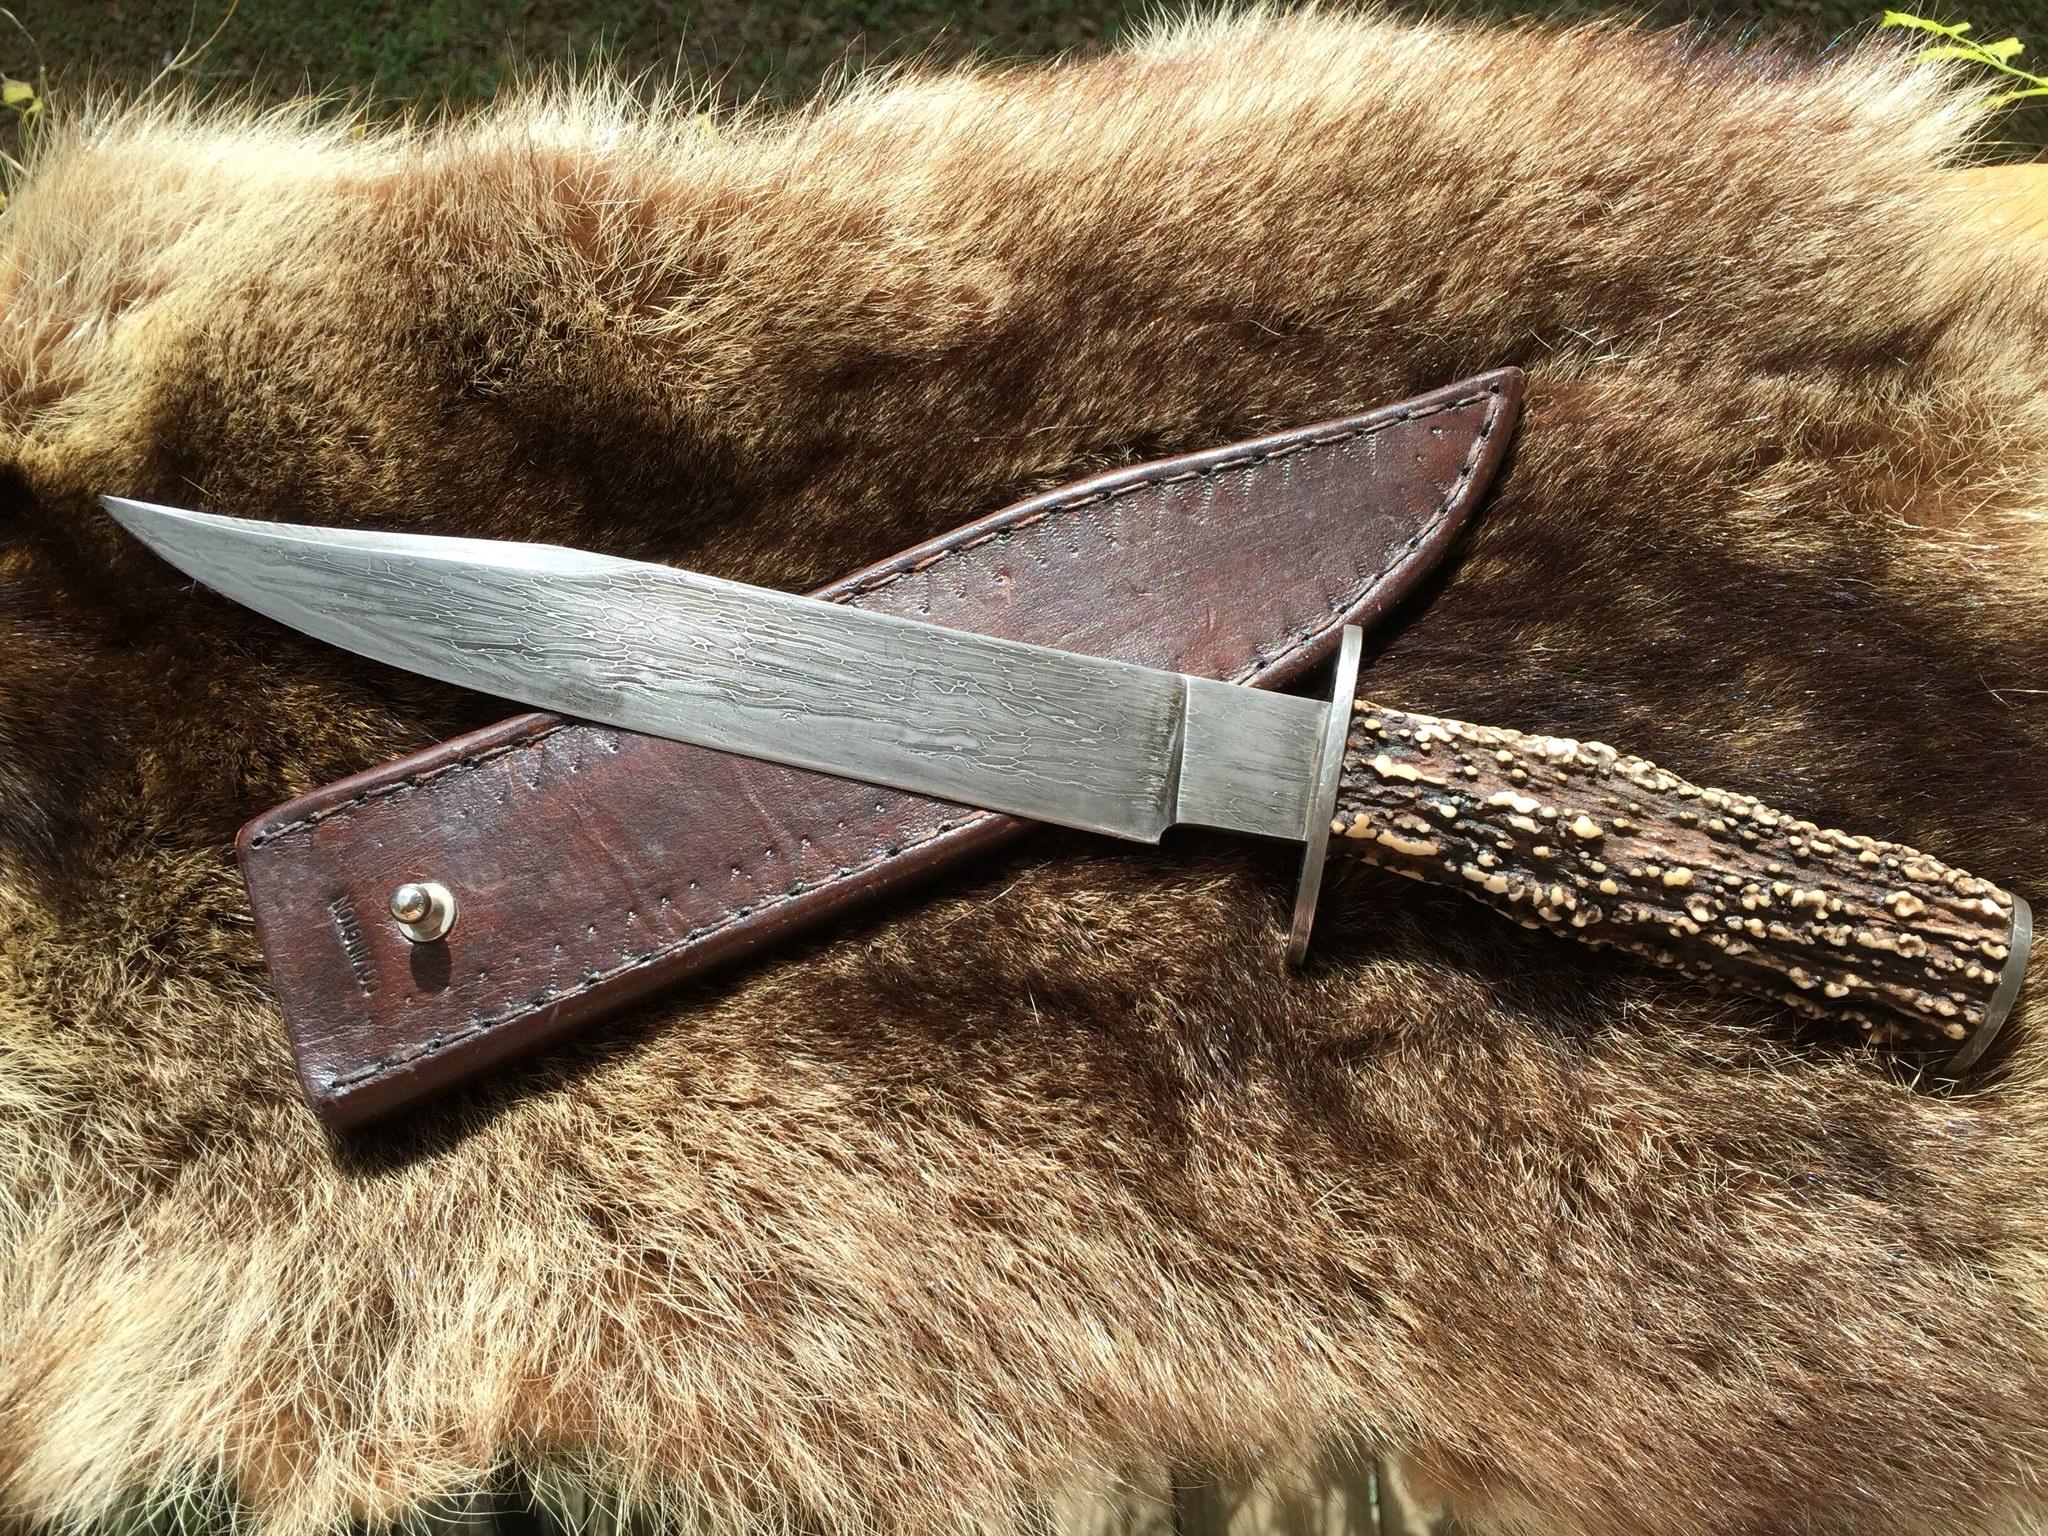 The Official Fixed Blade Knife Thread-8672807a-ccd7-4ea3-92fd-a5059e64519c.jpeg